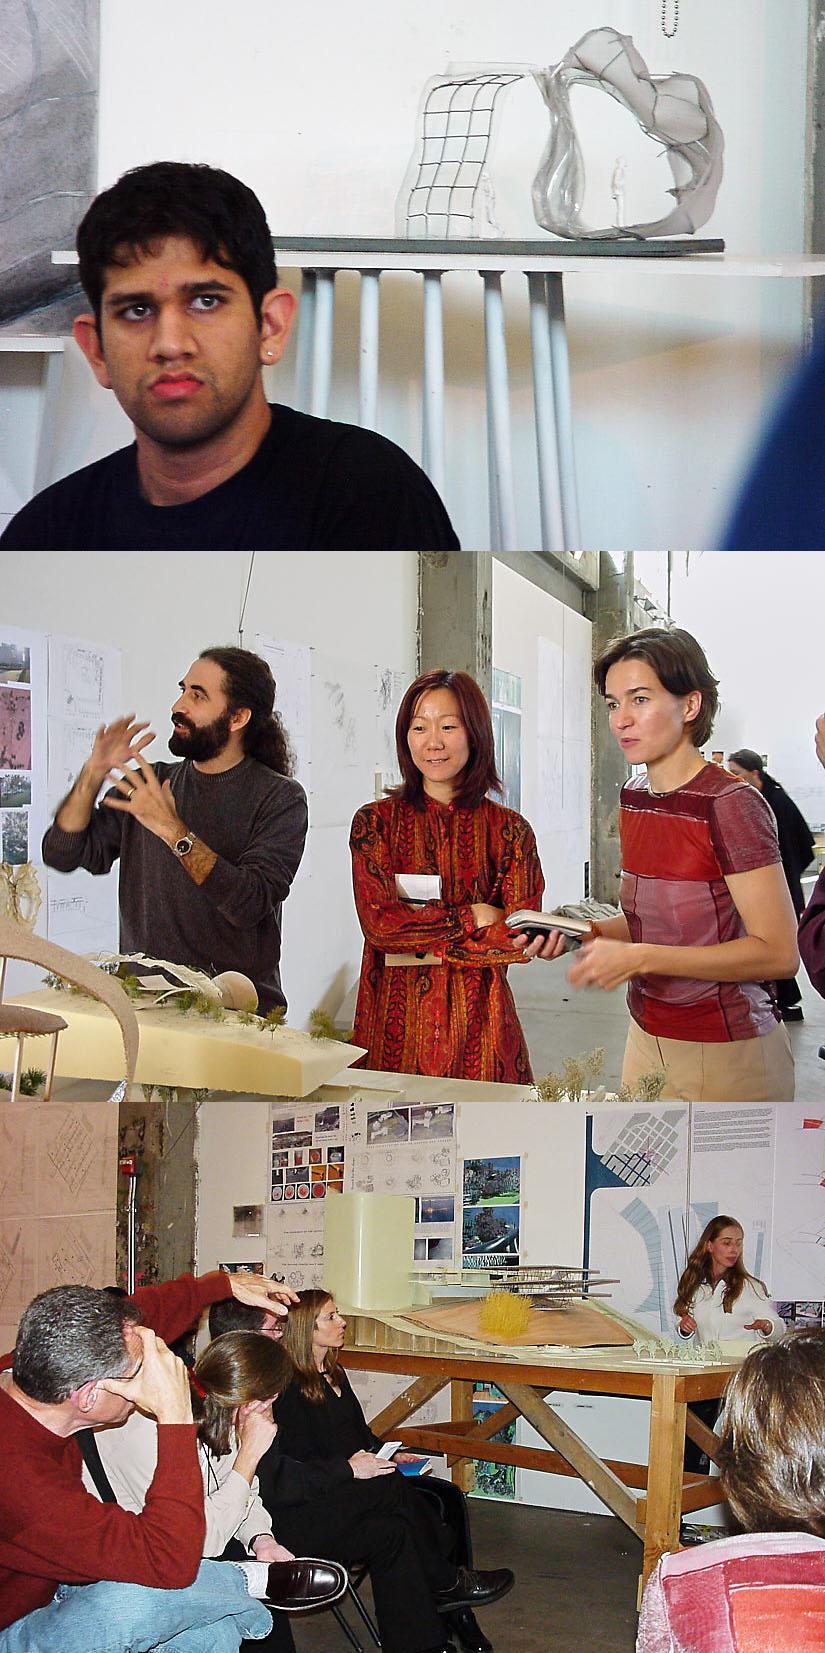 SCIArc Teaching: Los Angeles 2002